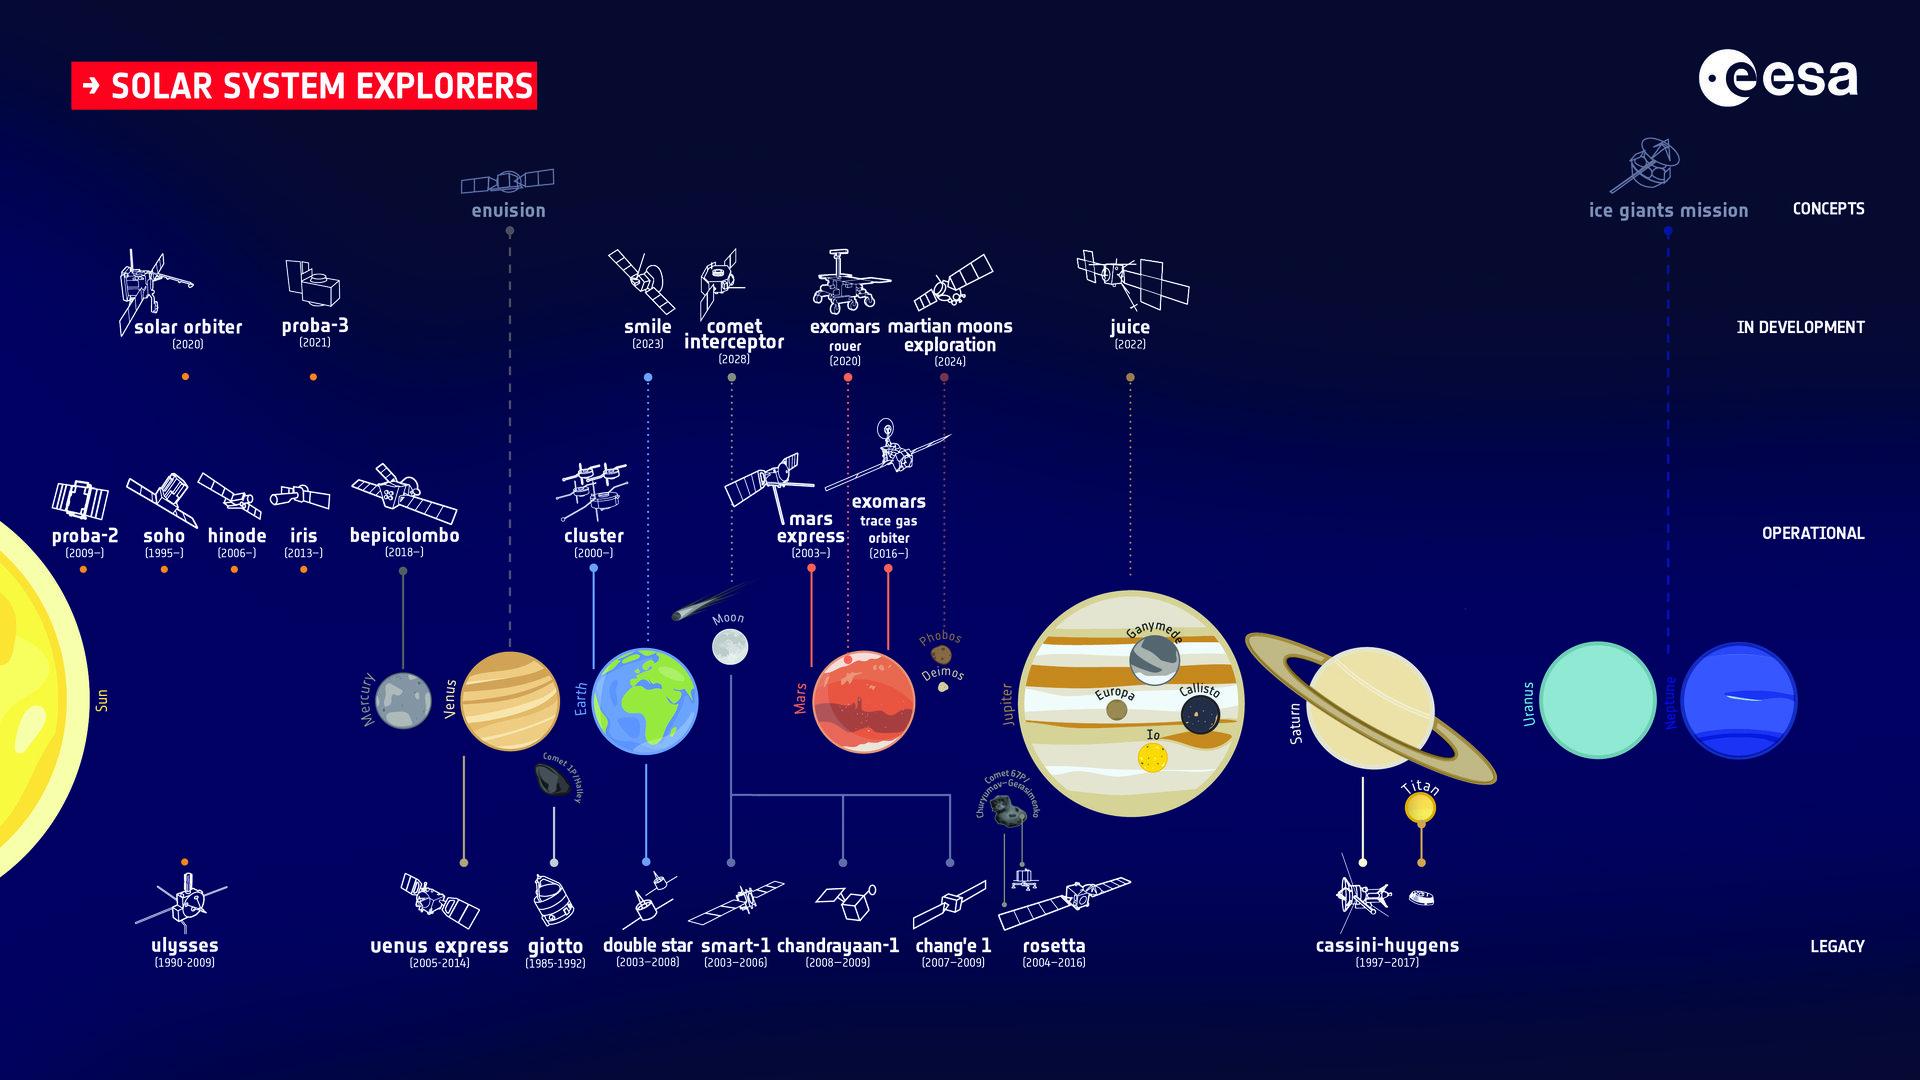 Esa Esas Fleet Of Solar System Explorers